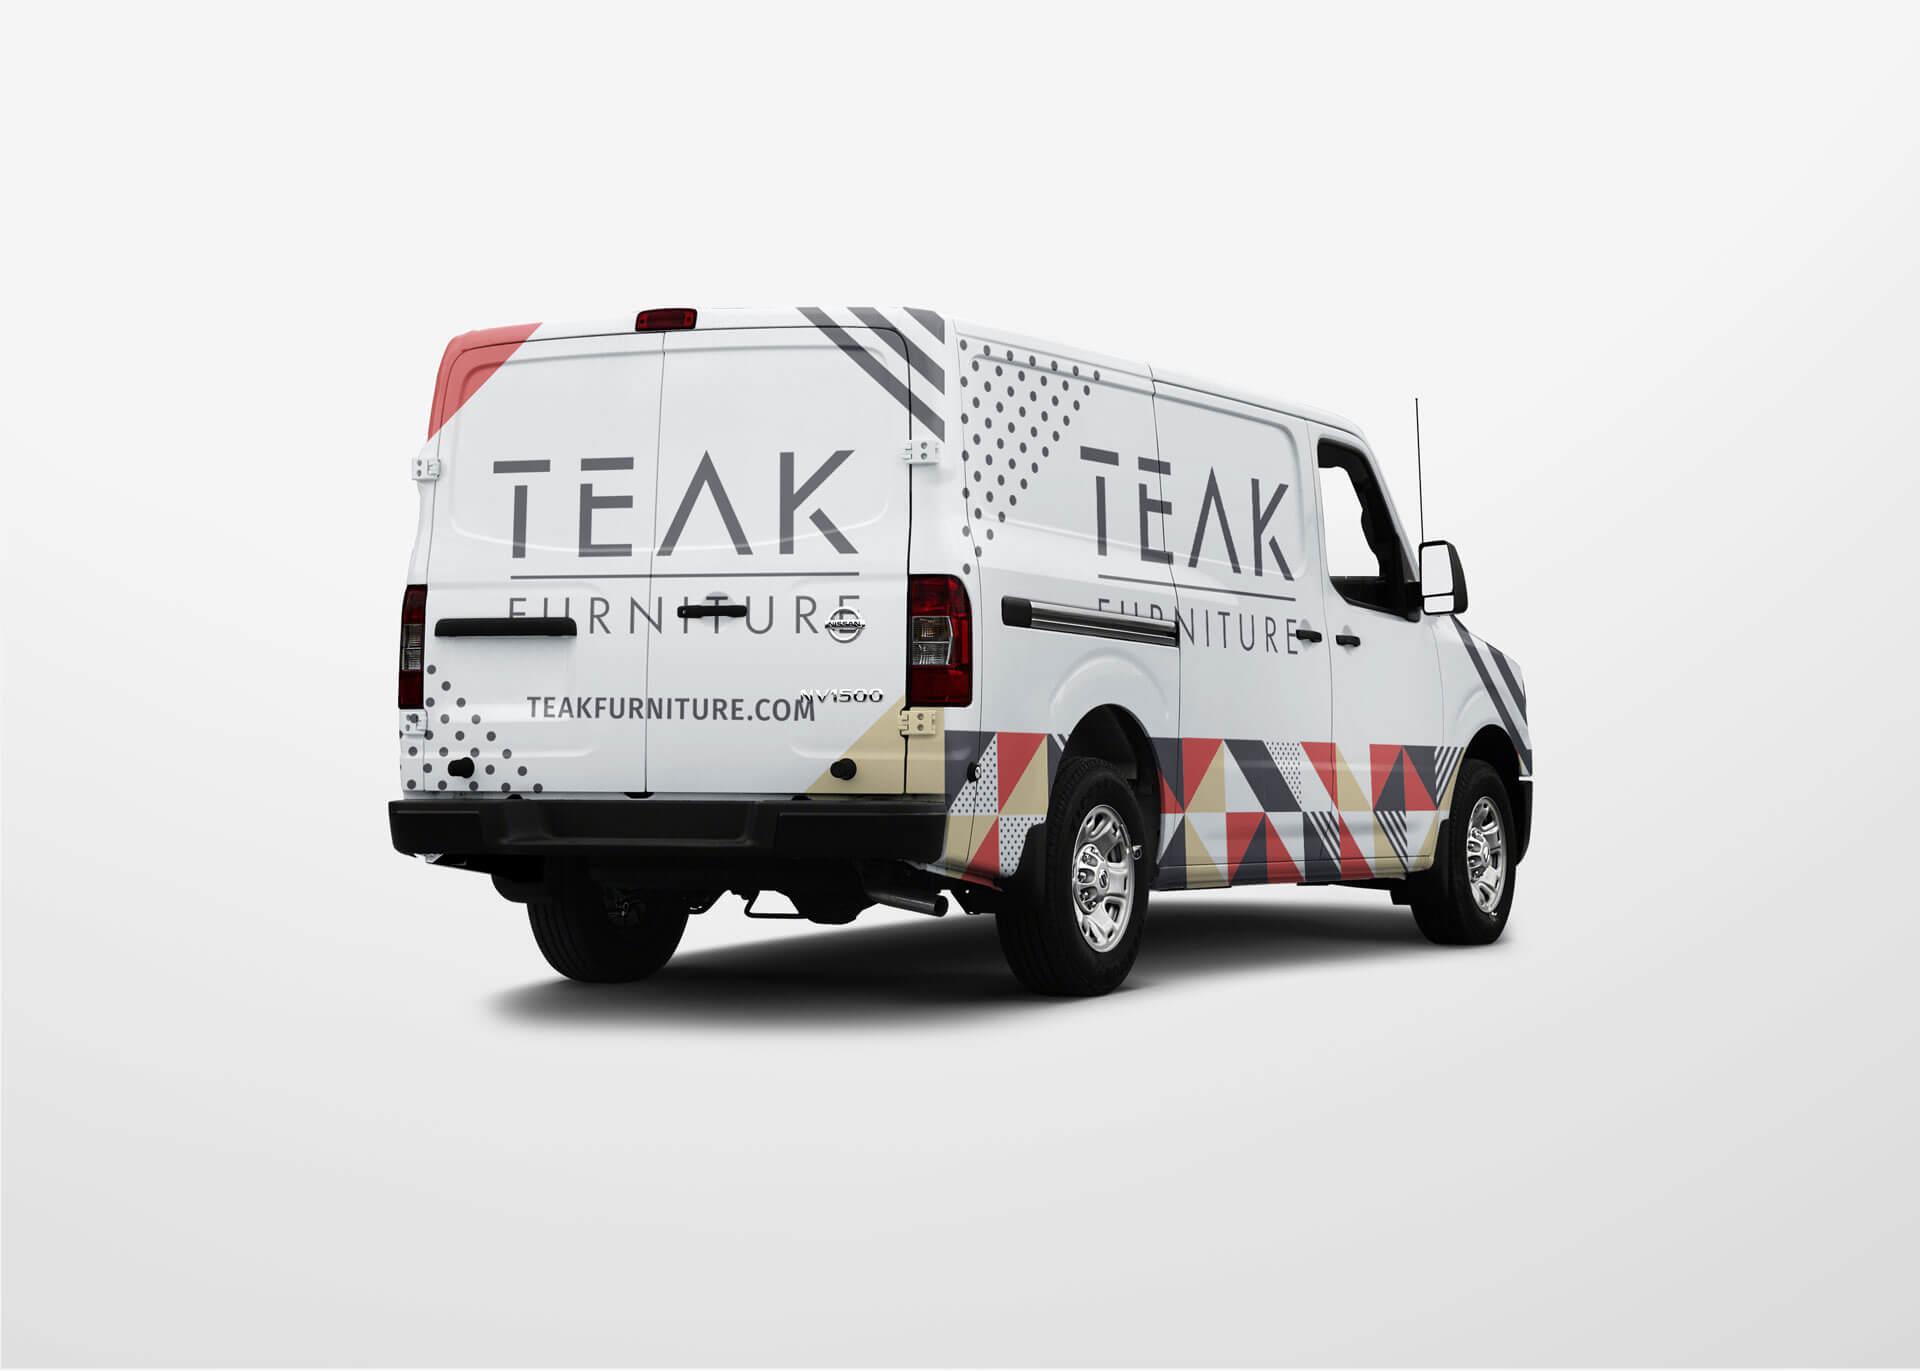 Teak furniture delivery van with vehicle wrap